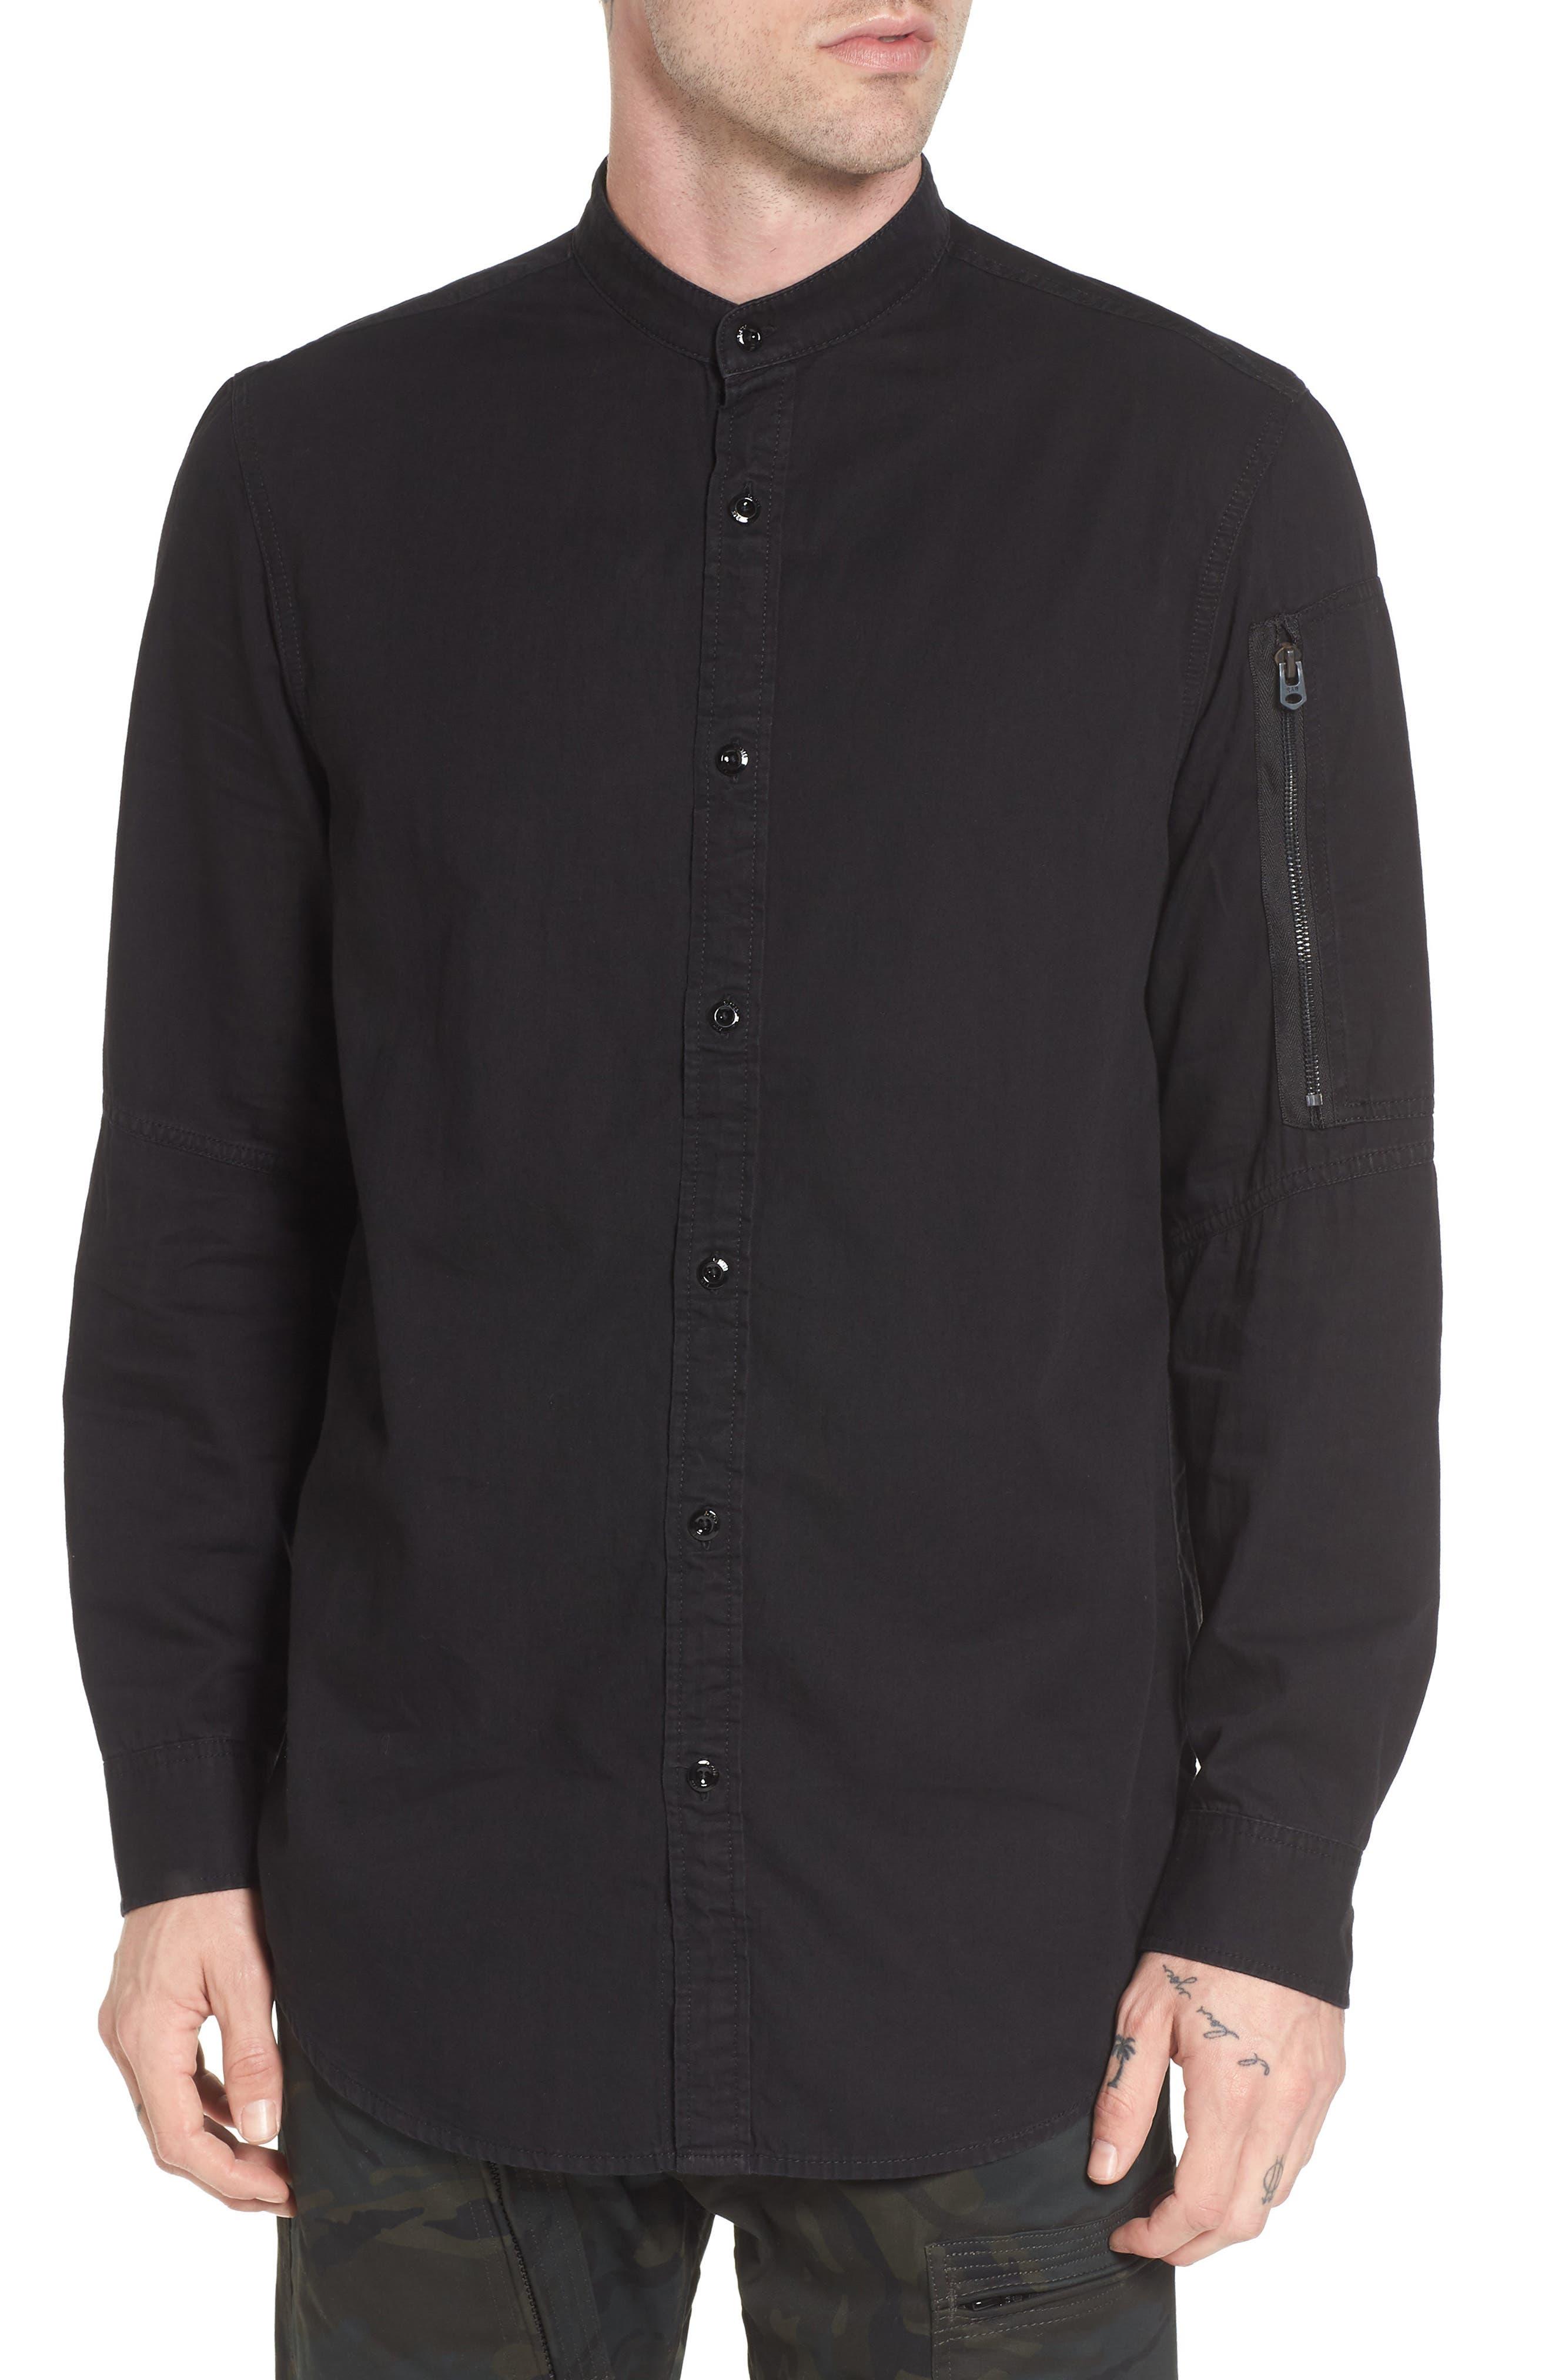 Stalt C-Less Shirt,                             Main thumbnail 1, color,                             001